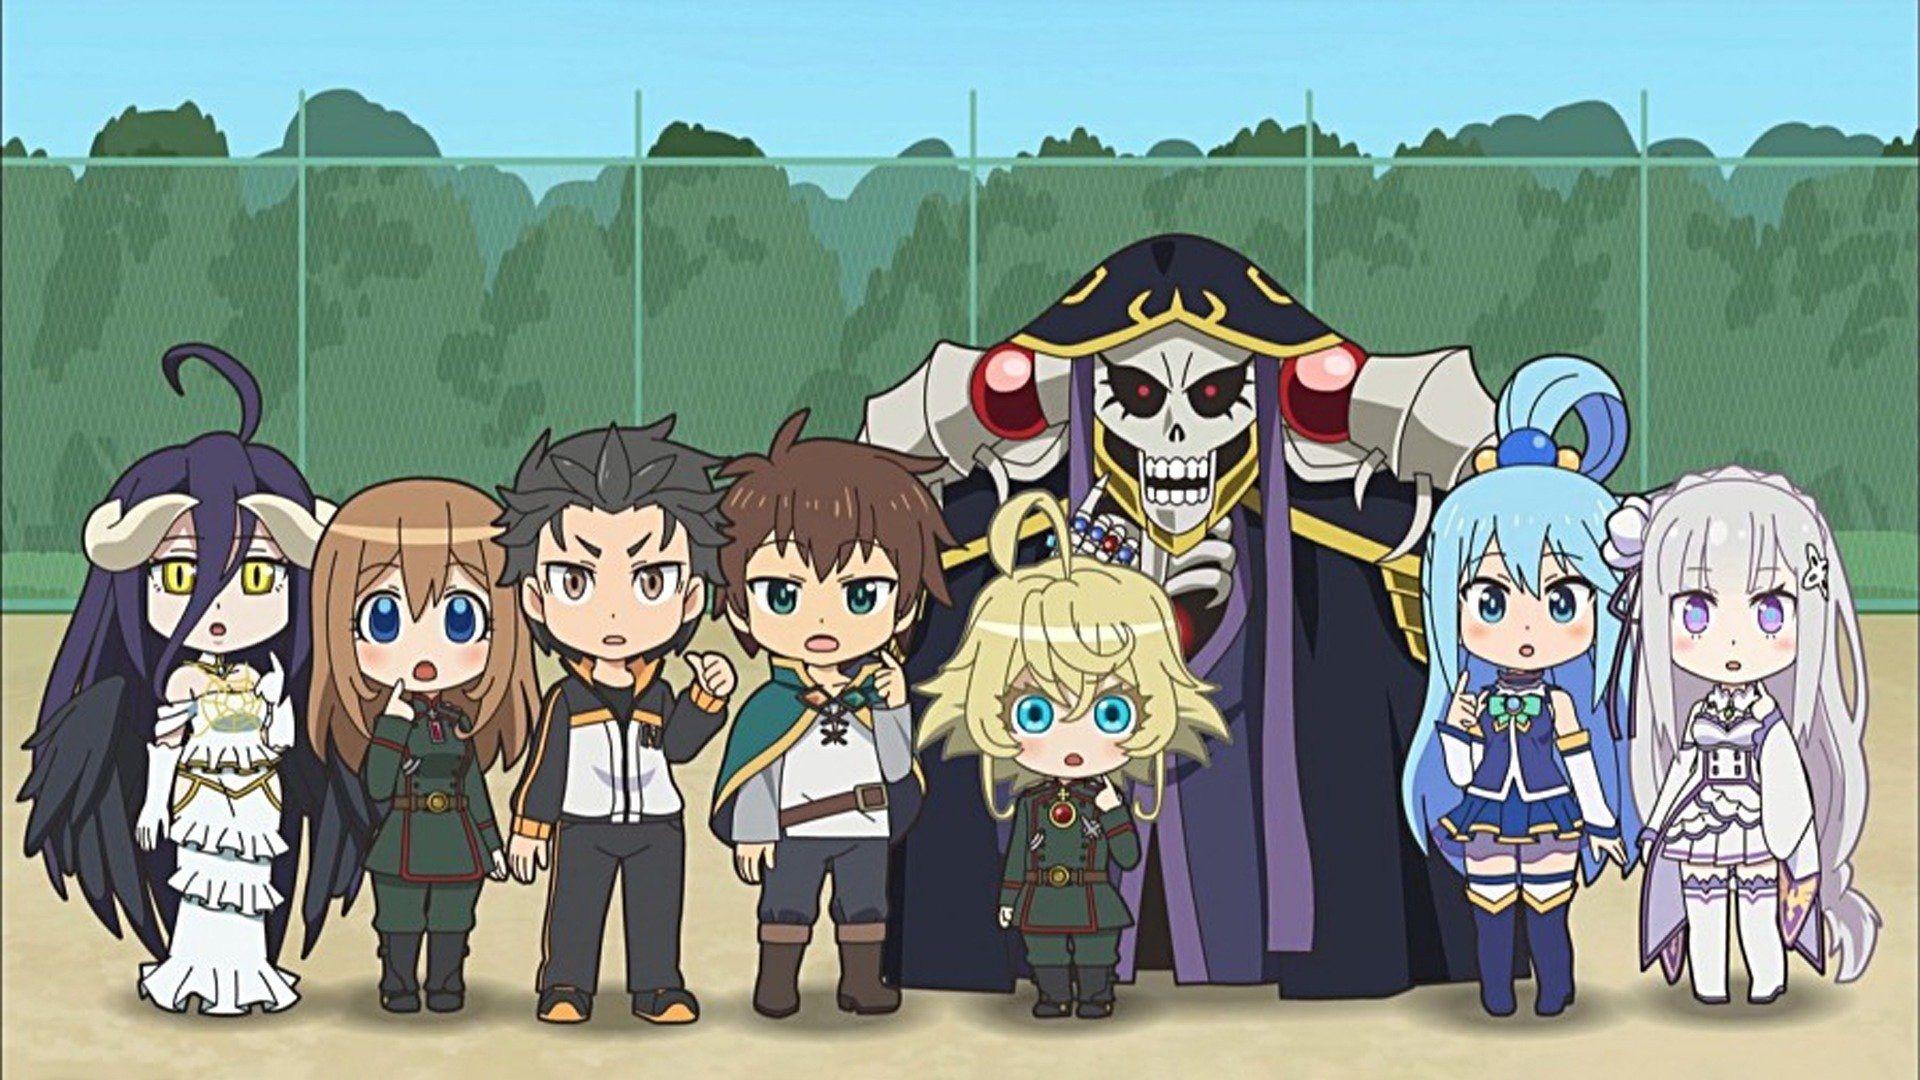 Isekai Quartet Watch Episodes On Funimation Or Streaming Online